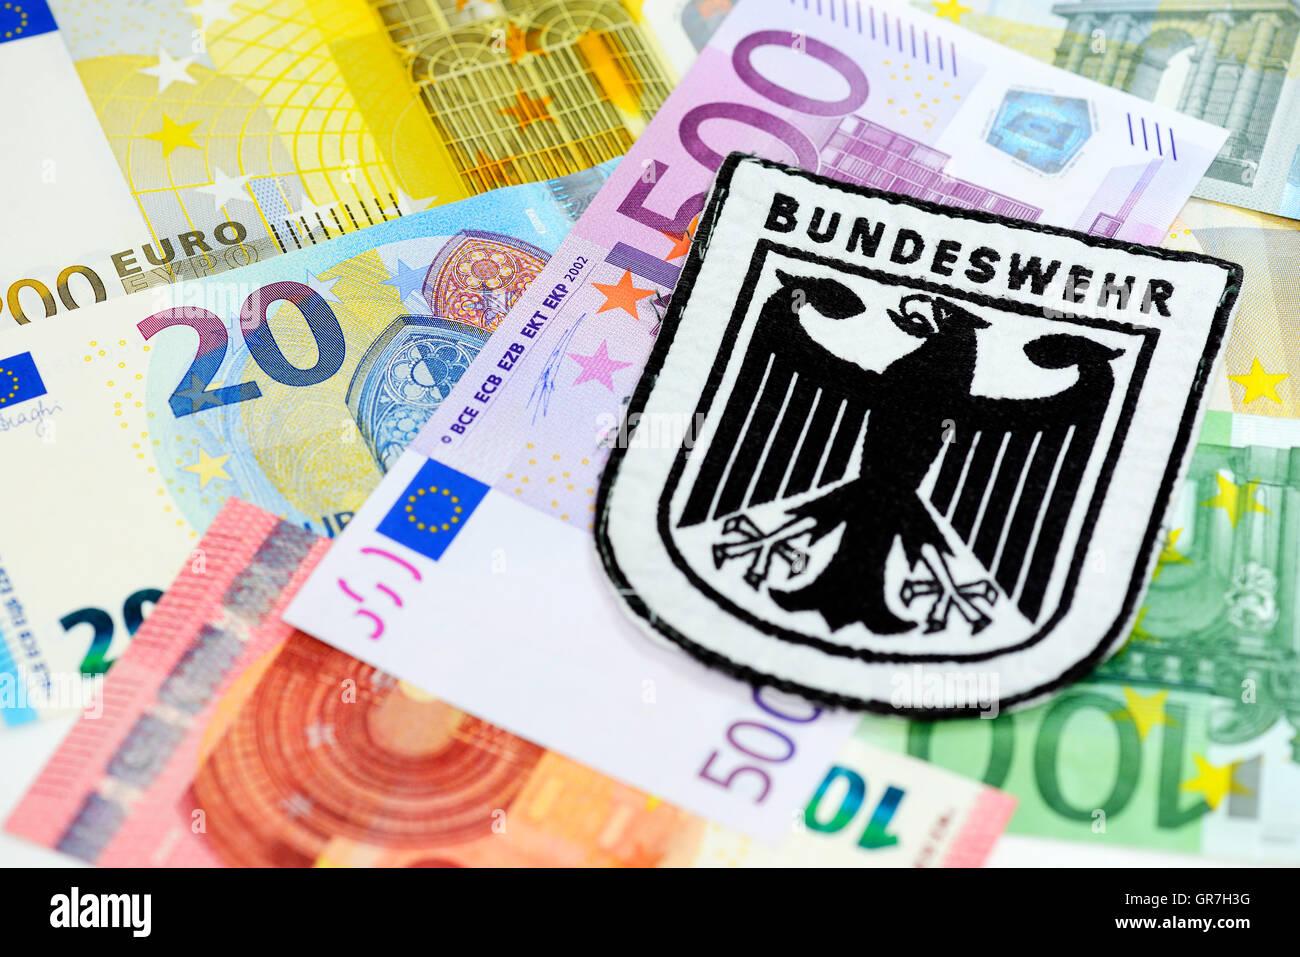 German Armed Forces Emblem On Euro Banknotes, Defense Spending - Stock Image